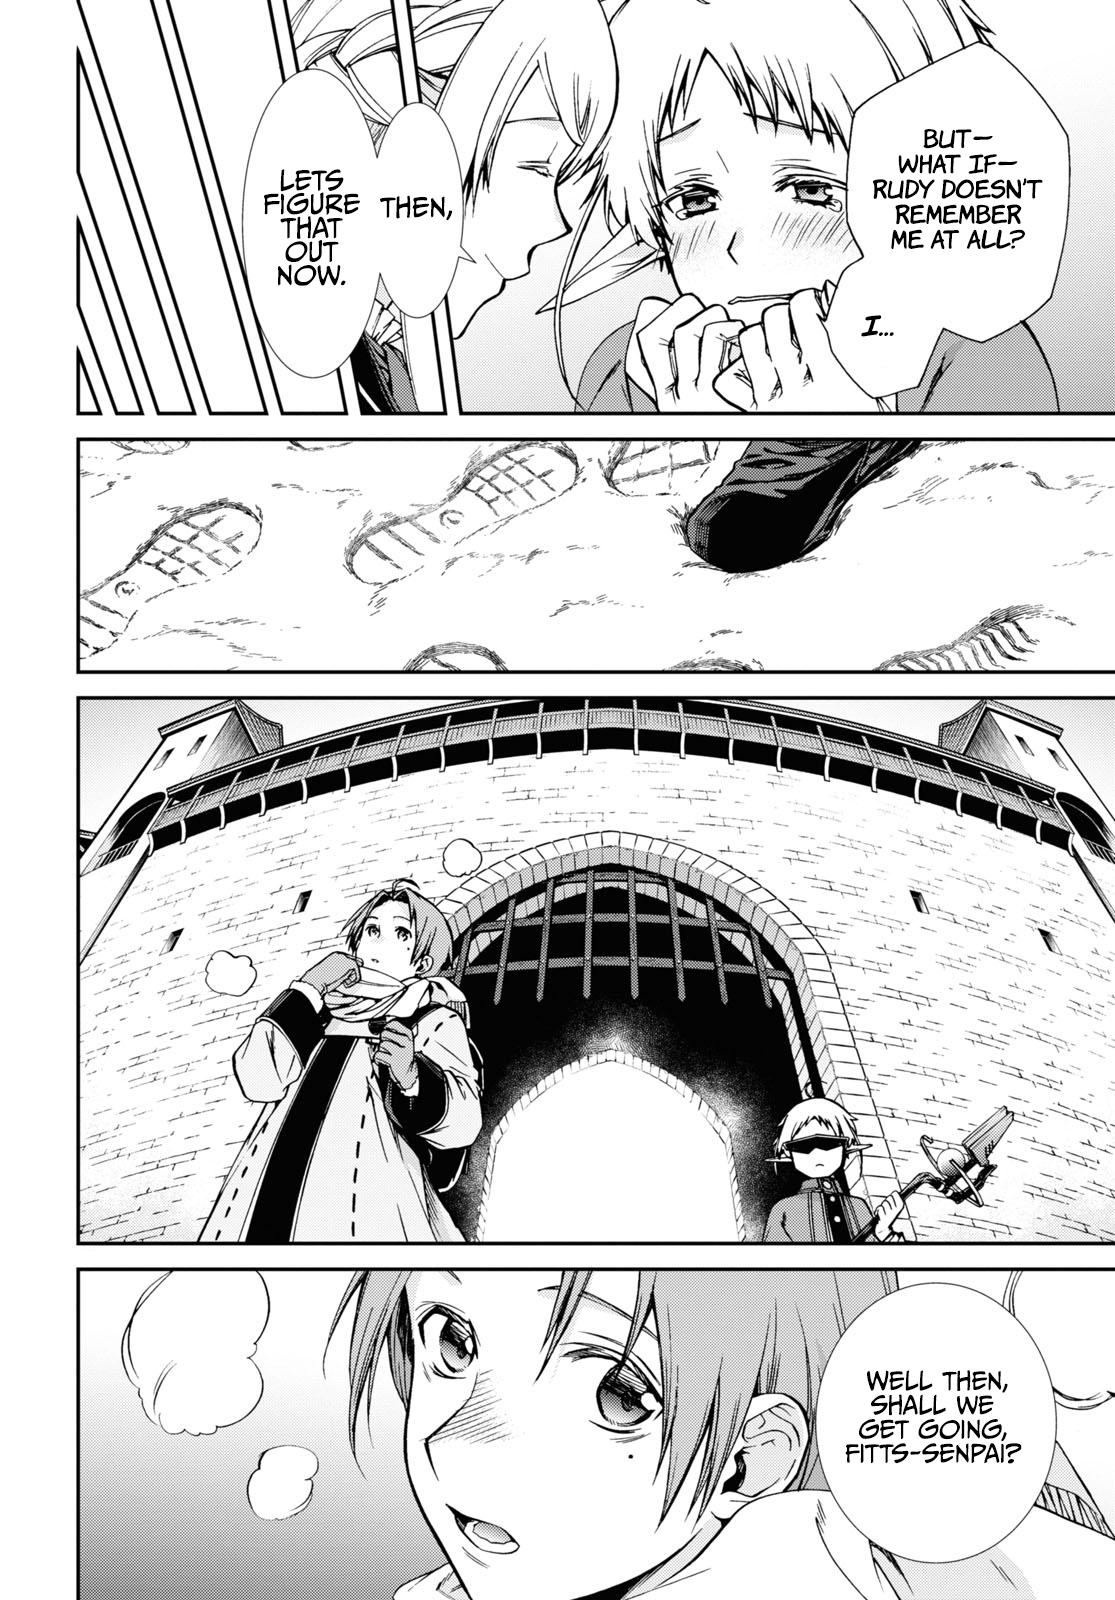 Mushoku Tensei: Jobless Reincarnation, Mushoku Tensei - Nouvelle vie, nouvelle chance, Mushoku Tensei: If I Get to a Parallel Universe I'll Bring Out my True Effort, Mushoku Tensei, Mushoku Tensei manga, Mushoku Tensei: Isekai Ittara Honki Dasu, Mushoku Tensei: Isekai Ittara Honki Dasu manga, mushoku tensei isekai ittara honki dasu episode 2 english sub, mushoku tensei isekai ittara honki dasu episode 1 english sub, mushoku tensei isekai ittara honki dasu ep 3, mushoku tensei episode 3 release date, mushoku tensei rudeus, mushoku tensei characters, mushoku tensei mal, mushoku tensei how many episodes, mushoku tensei light novel, mushoku tensei wiki, mushoku tensei ep 2, mushoku tensei crunchyroll, mushoku tensei ep 3, roxy migurdia, mushoku tensei sub indo, mushoku tensei reddit, mushoku tensei netflix, sylphiette, future rudeus, mushoku tensei volume 1 illustrations, studio bind, mushoku tensei isekai ittara honki dasu, mushoku tensei episode 1, mushoku tensei novel, mushoku tensei manga volume 1, mushoku tensei anime episode 1, mushoku tensei volume 23, mushoku tensei episode 1 sub indo, mushoku tensei amazon, mushoku tensei vietsub, mushoku tensei: jobless reincarnation vostfr, mushoku tensei isekai ittara honki dasu ep 2, mushoku tensei isekai ittara honki dasu streaming,chapter,chapters,webcomic